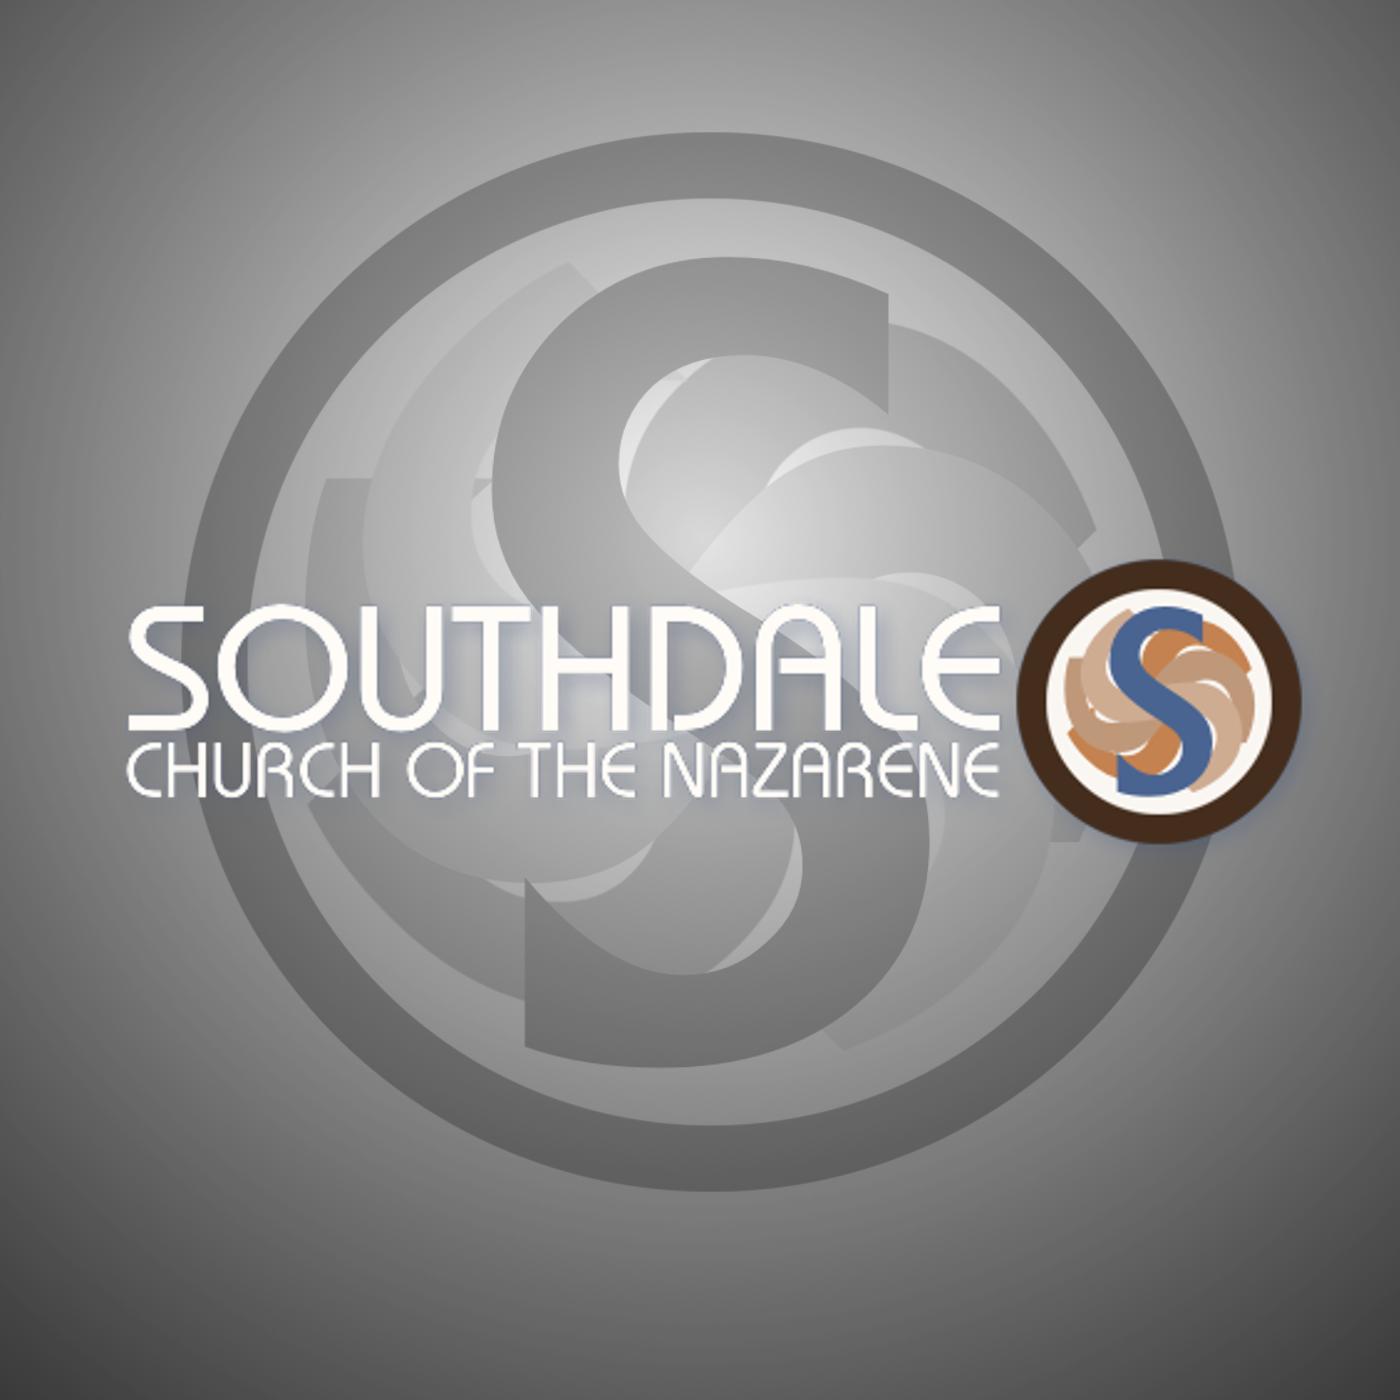 Southdale Church of the Nazarene (podcast) - Bradley Buhro